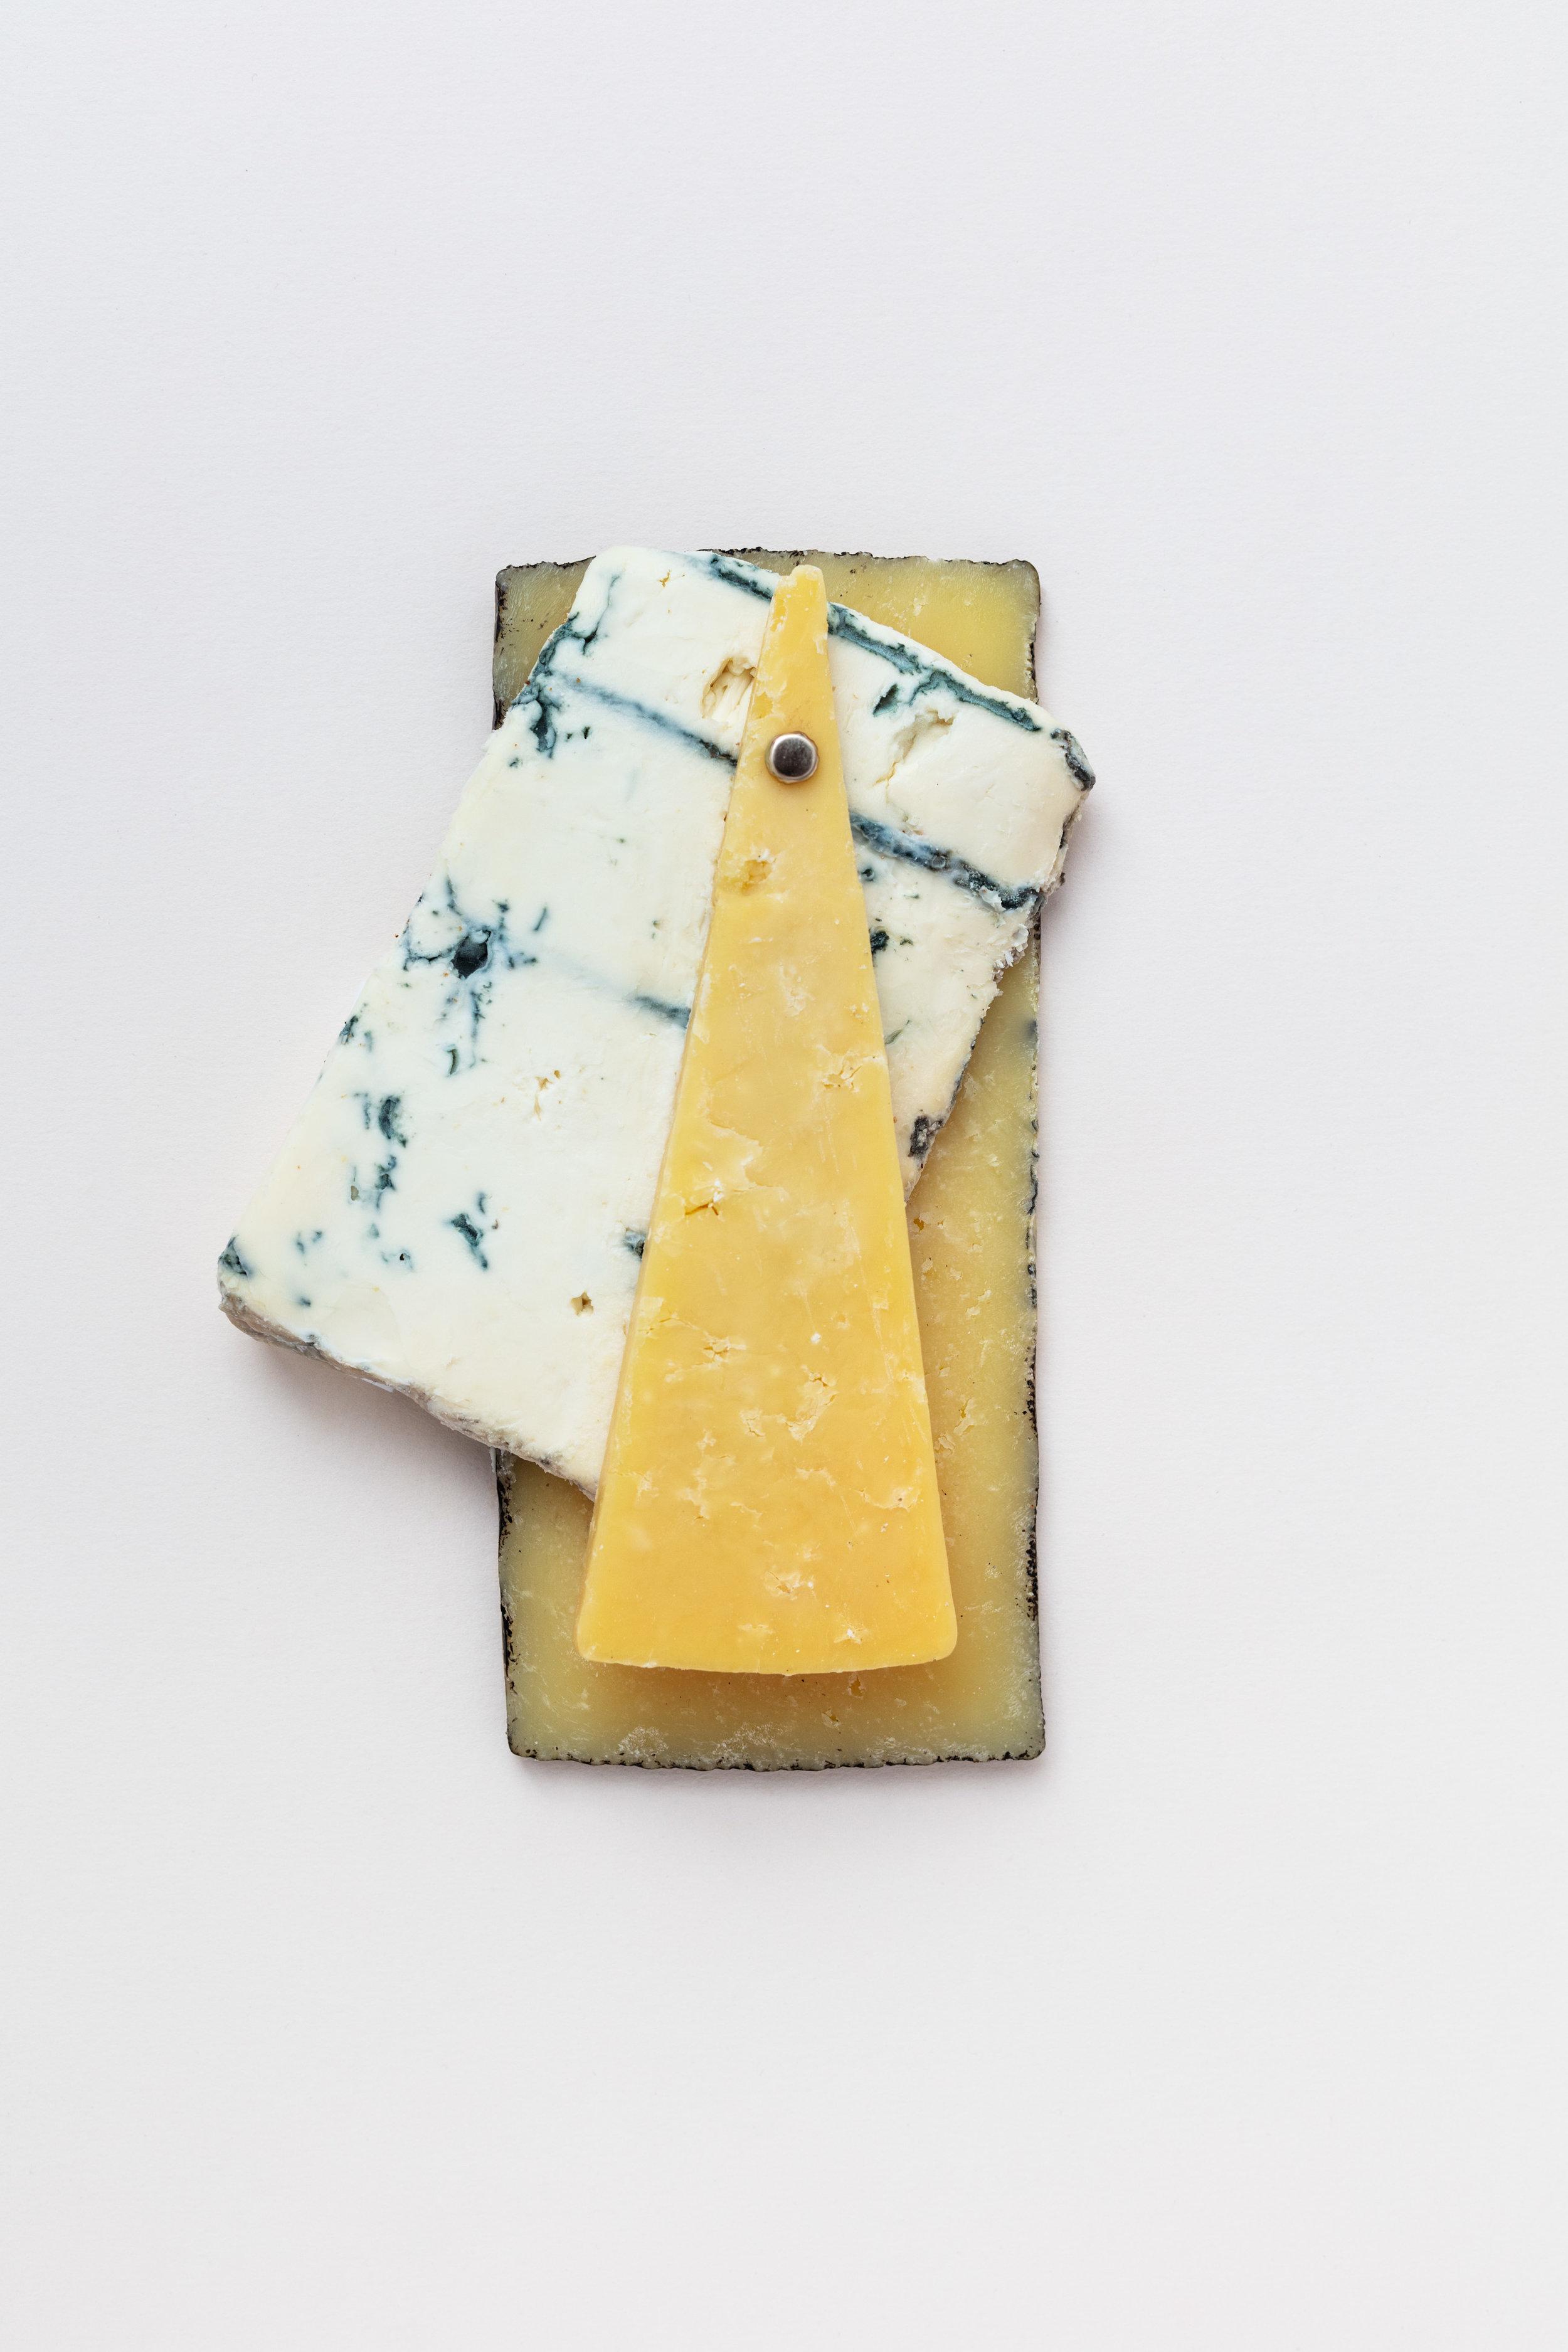 NP-CW-Cheese11.jpg